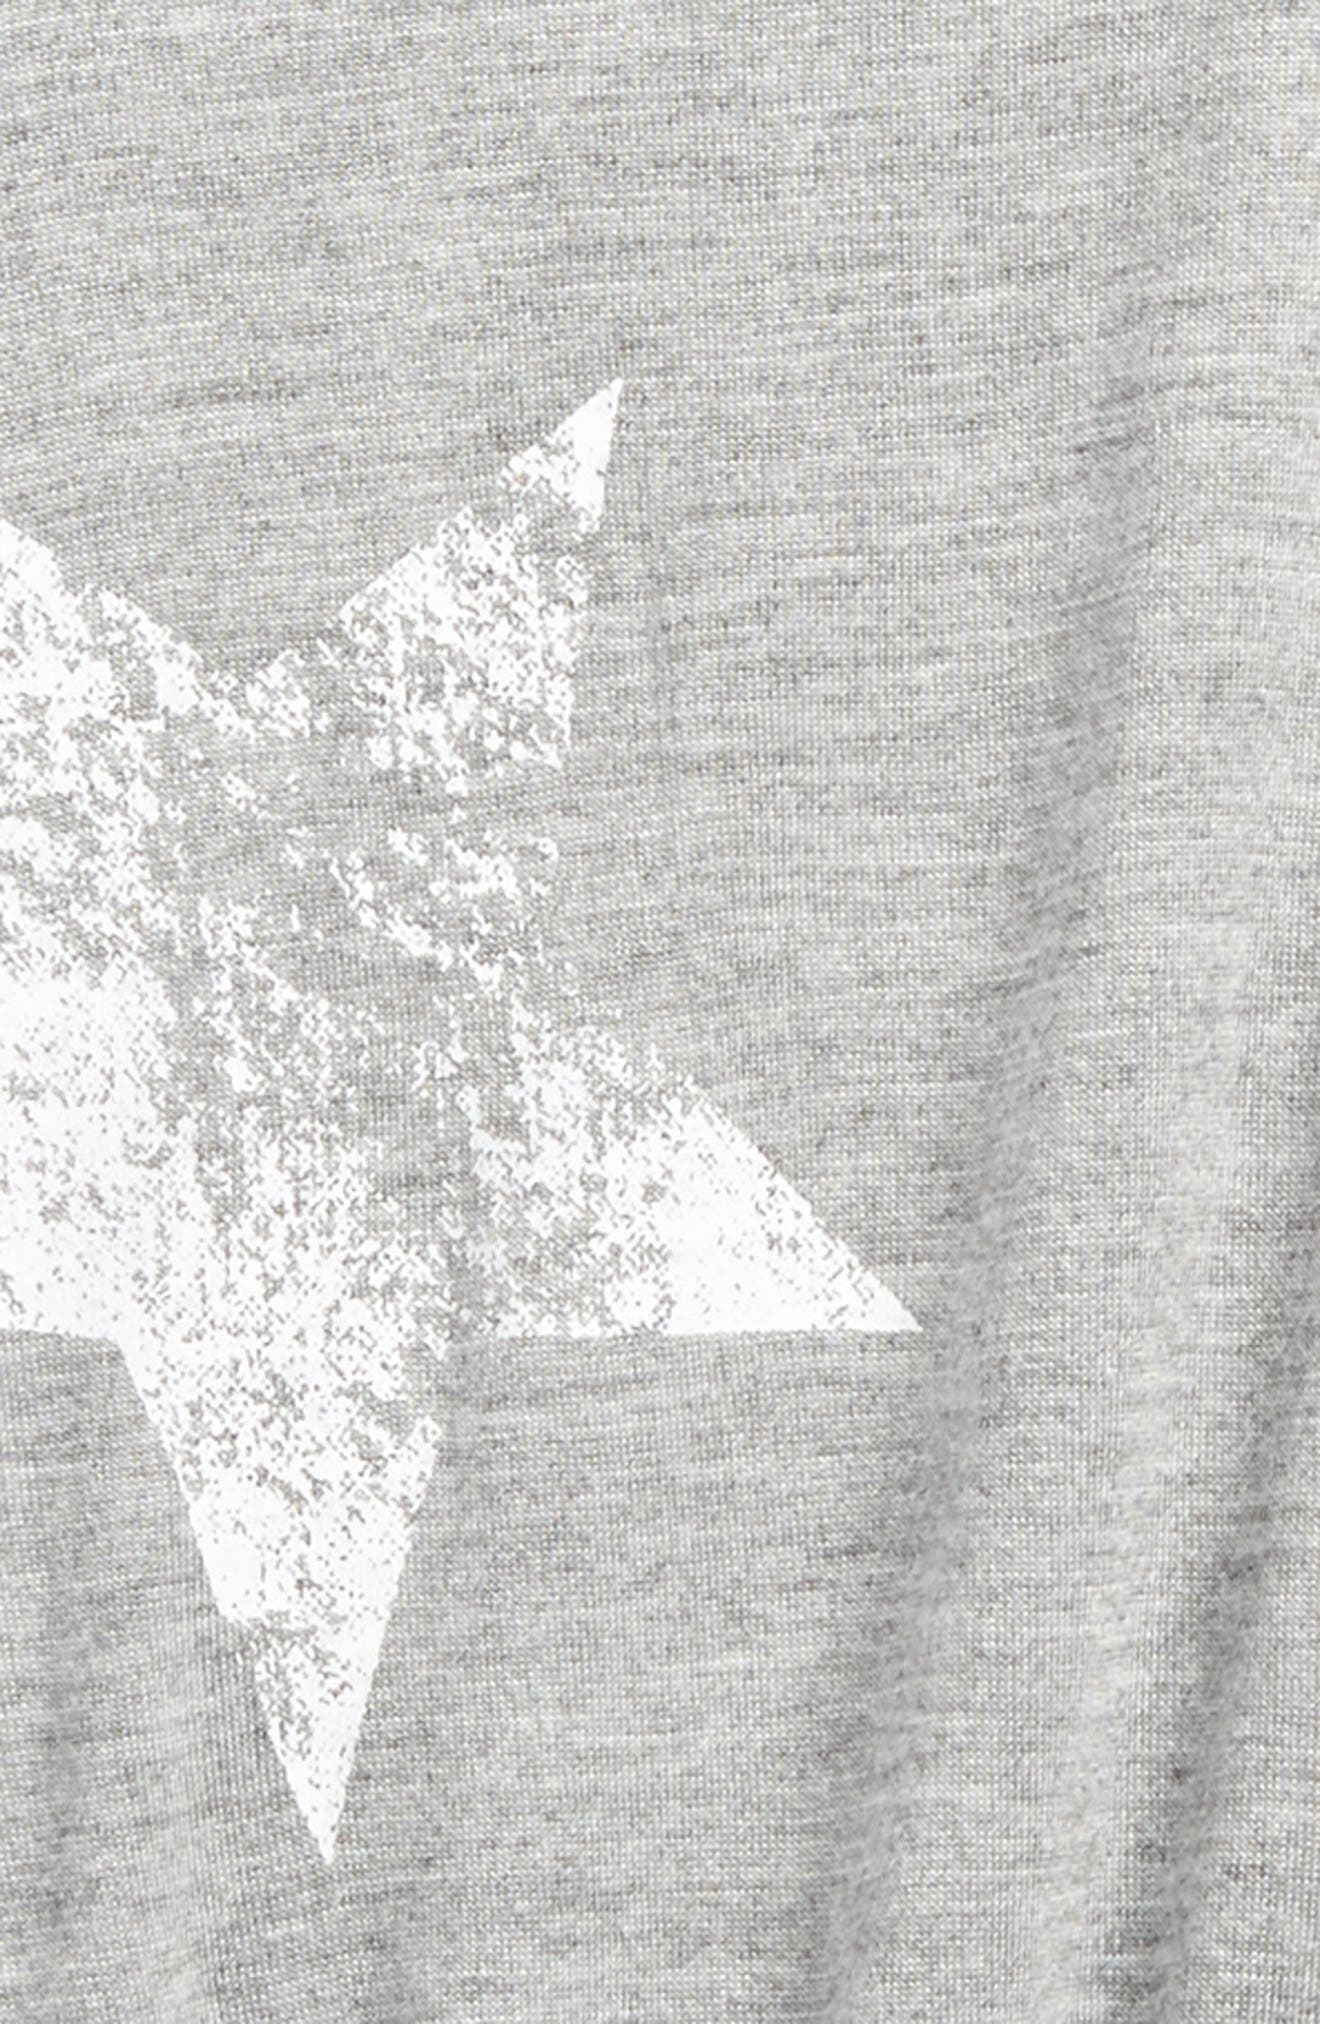 Star Print Knit Romper,                             Alternate thumbnail 2, color,                             Grey Mgrwst Stars Mgrwst